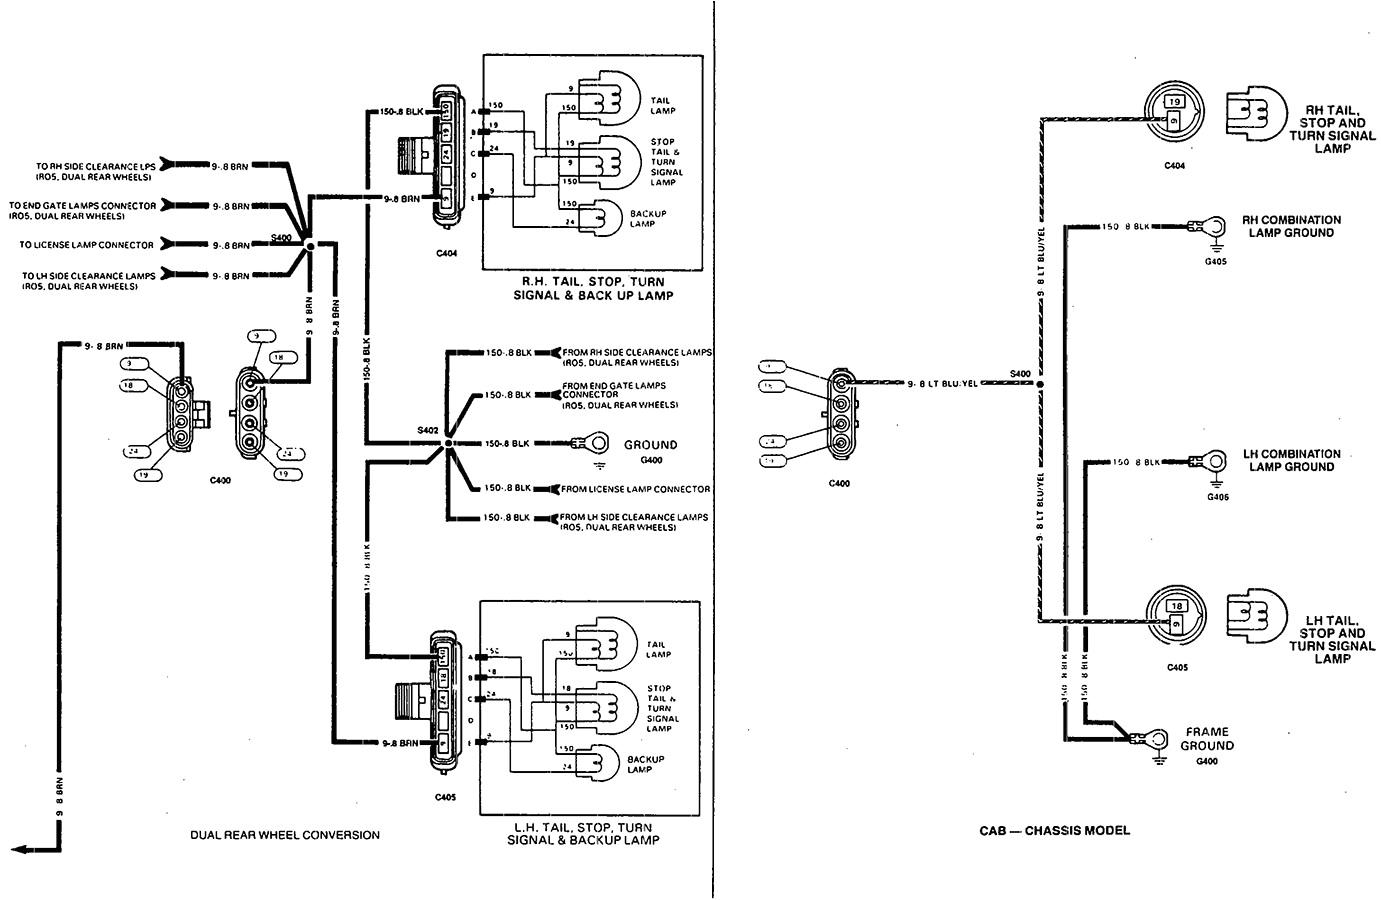 2003 2500hd wiring diagram blog wiring diagram 2006 chevrolet 2500 tail light wiring diagram